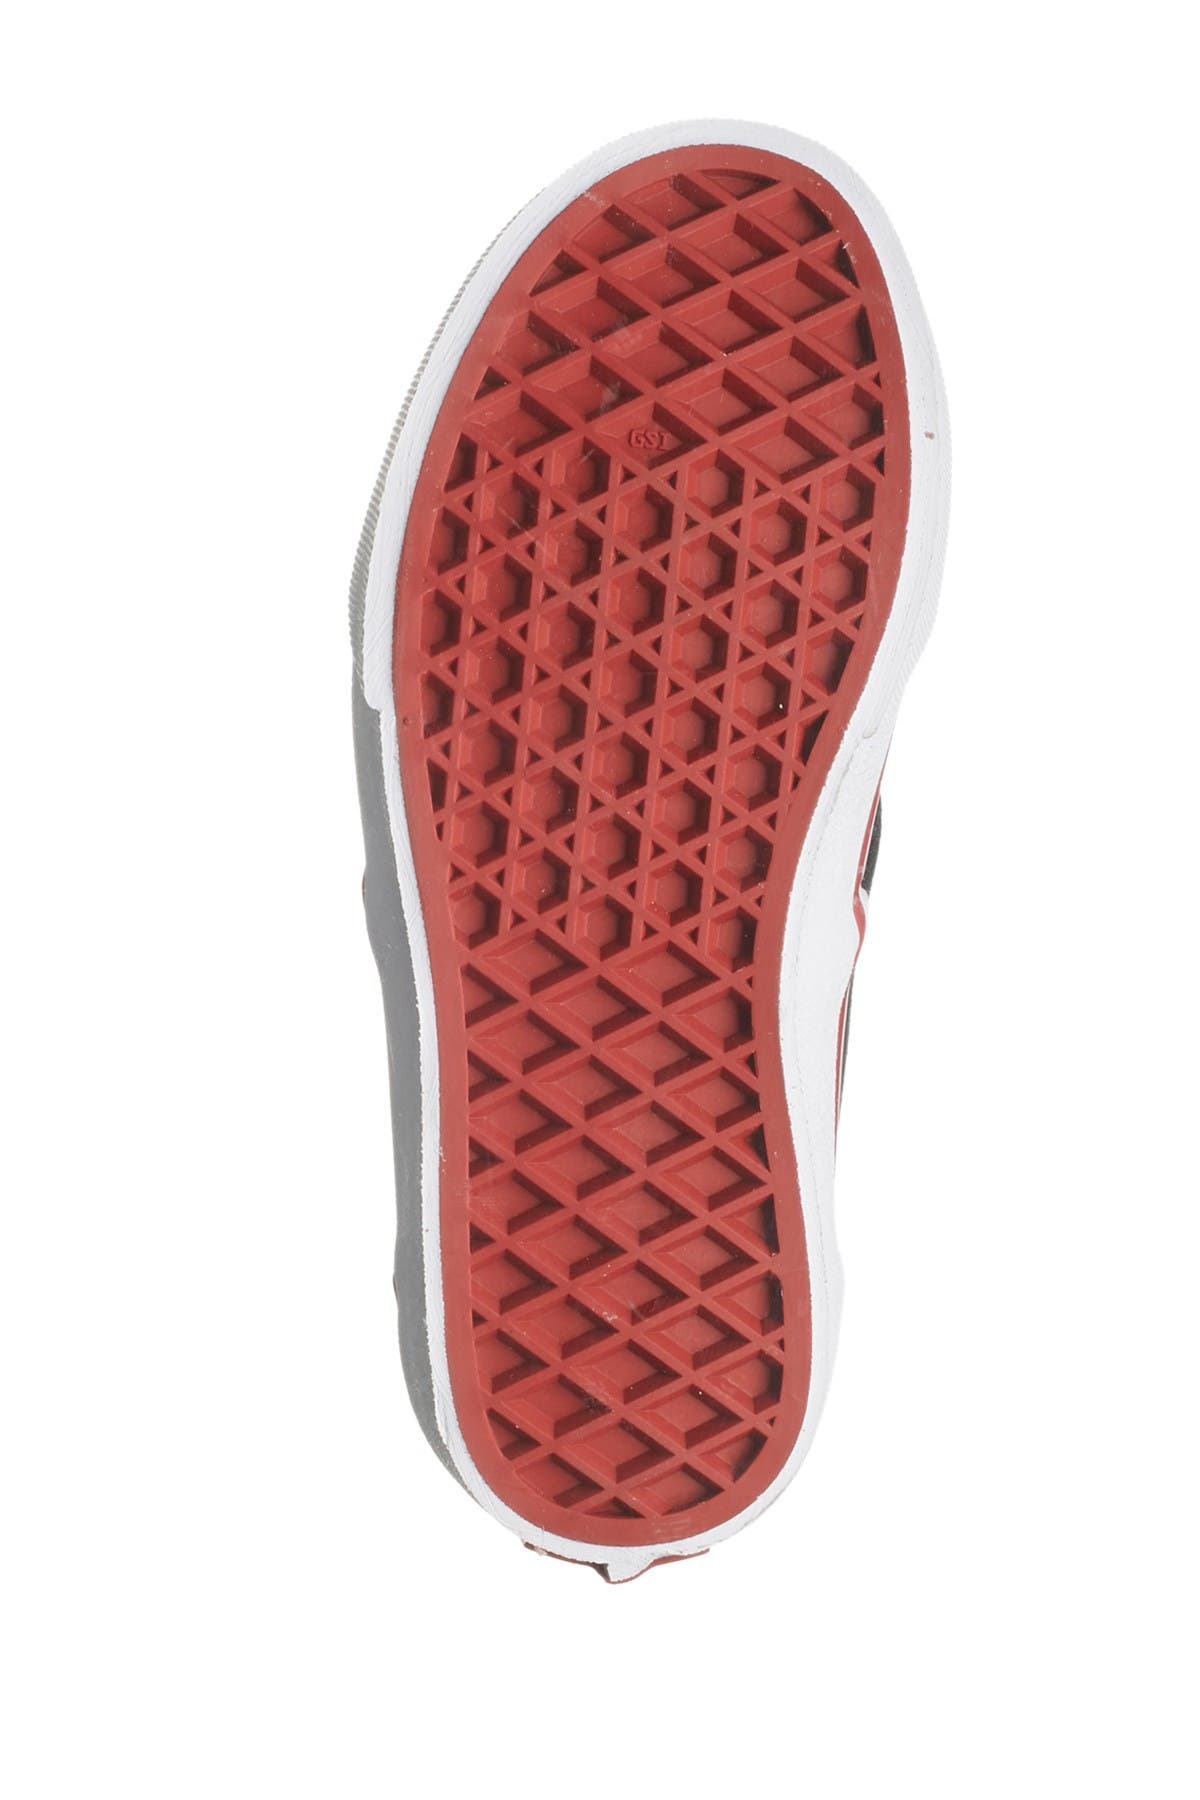 Image of VANS Atwood Sneaker